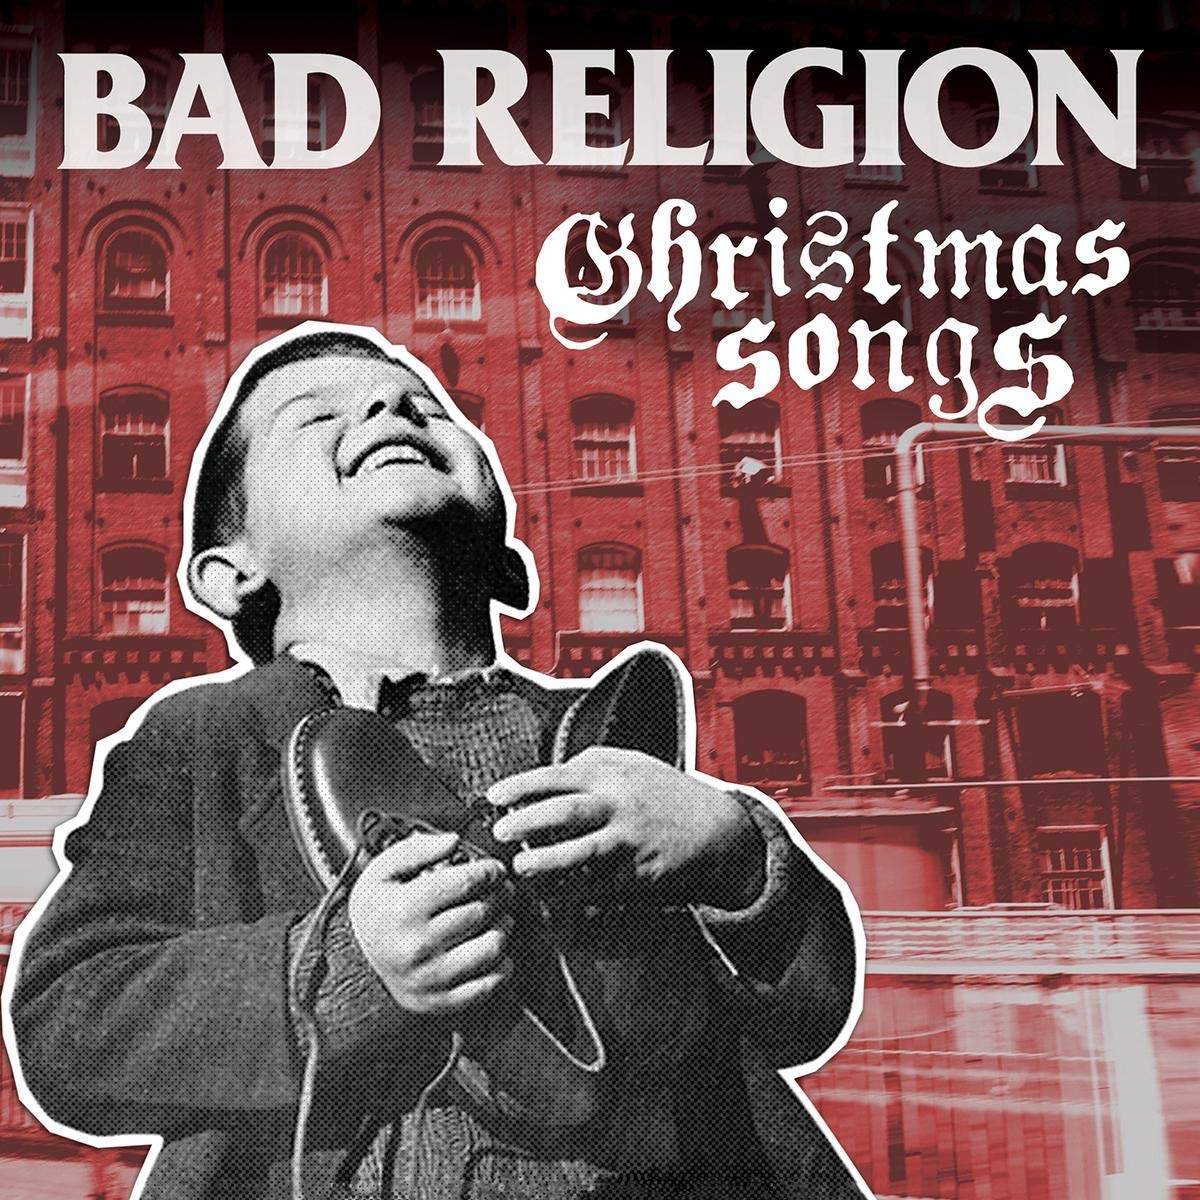 Bad Religion – Christmas Songs (2013) [FLAC]